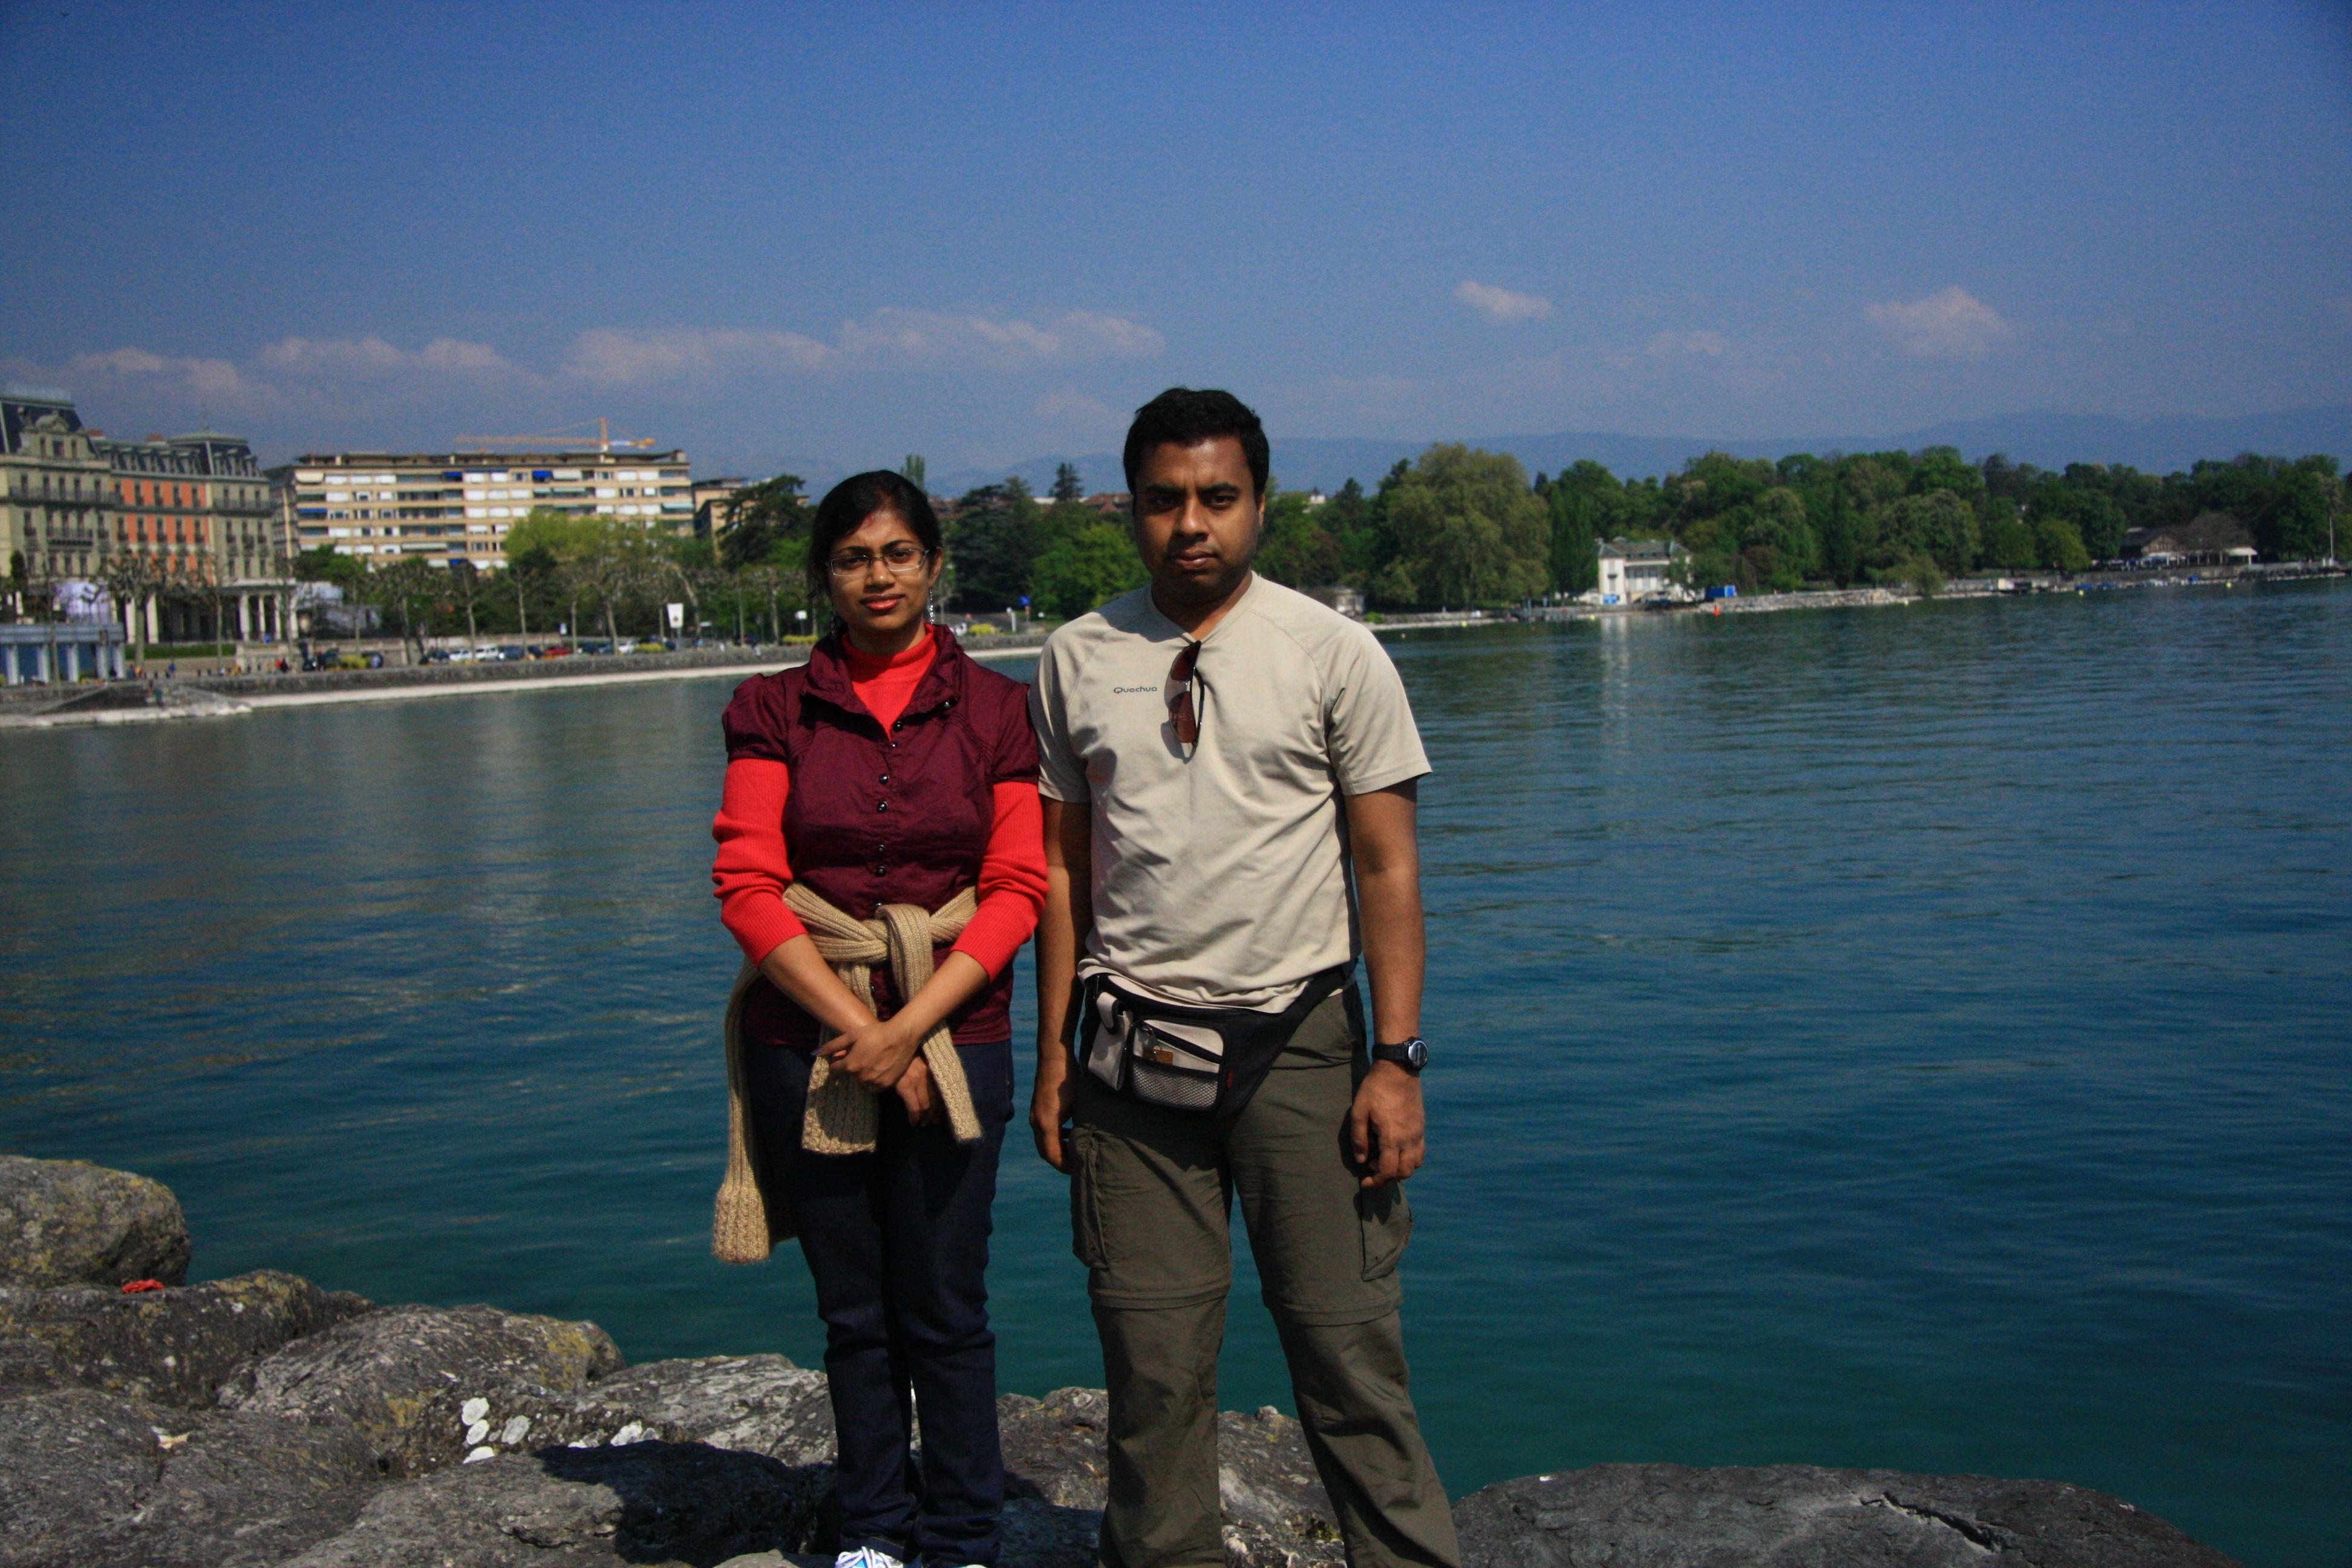 Montreux – Rochers de Naye